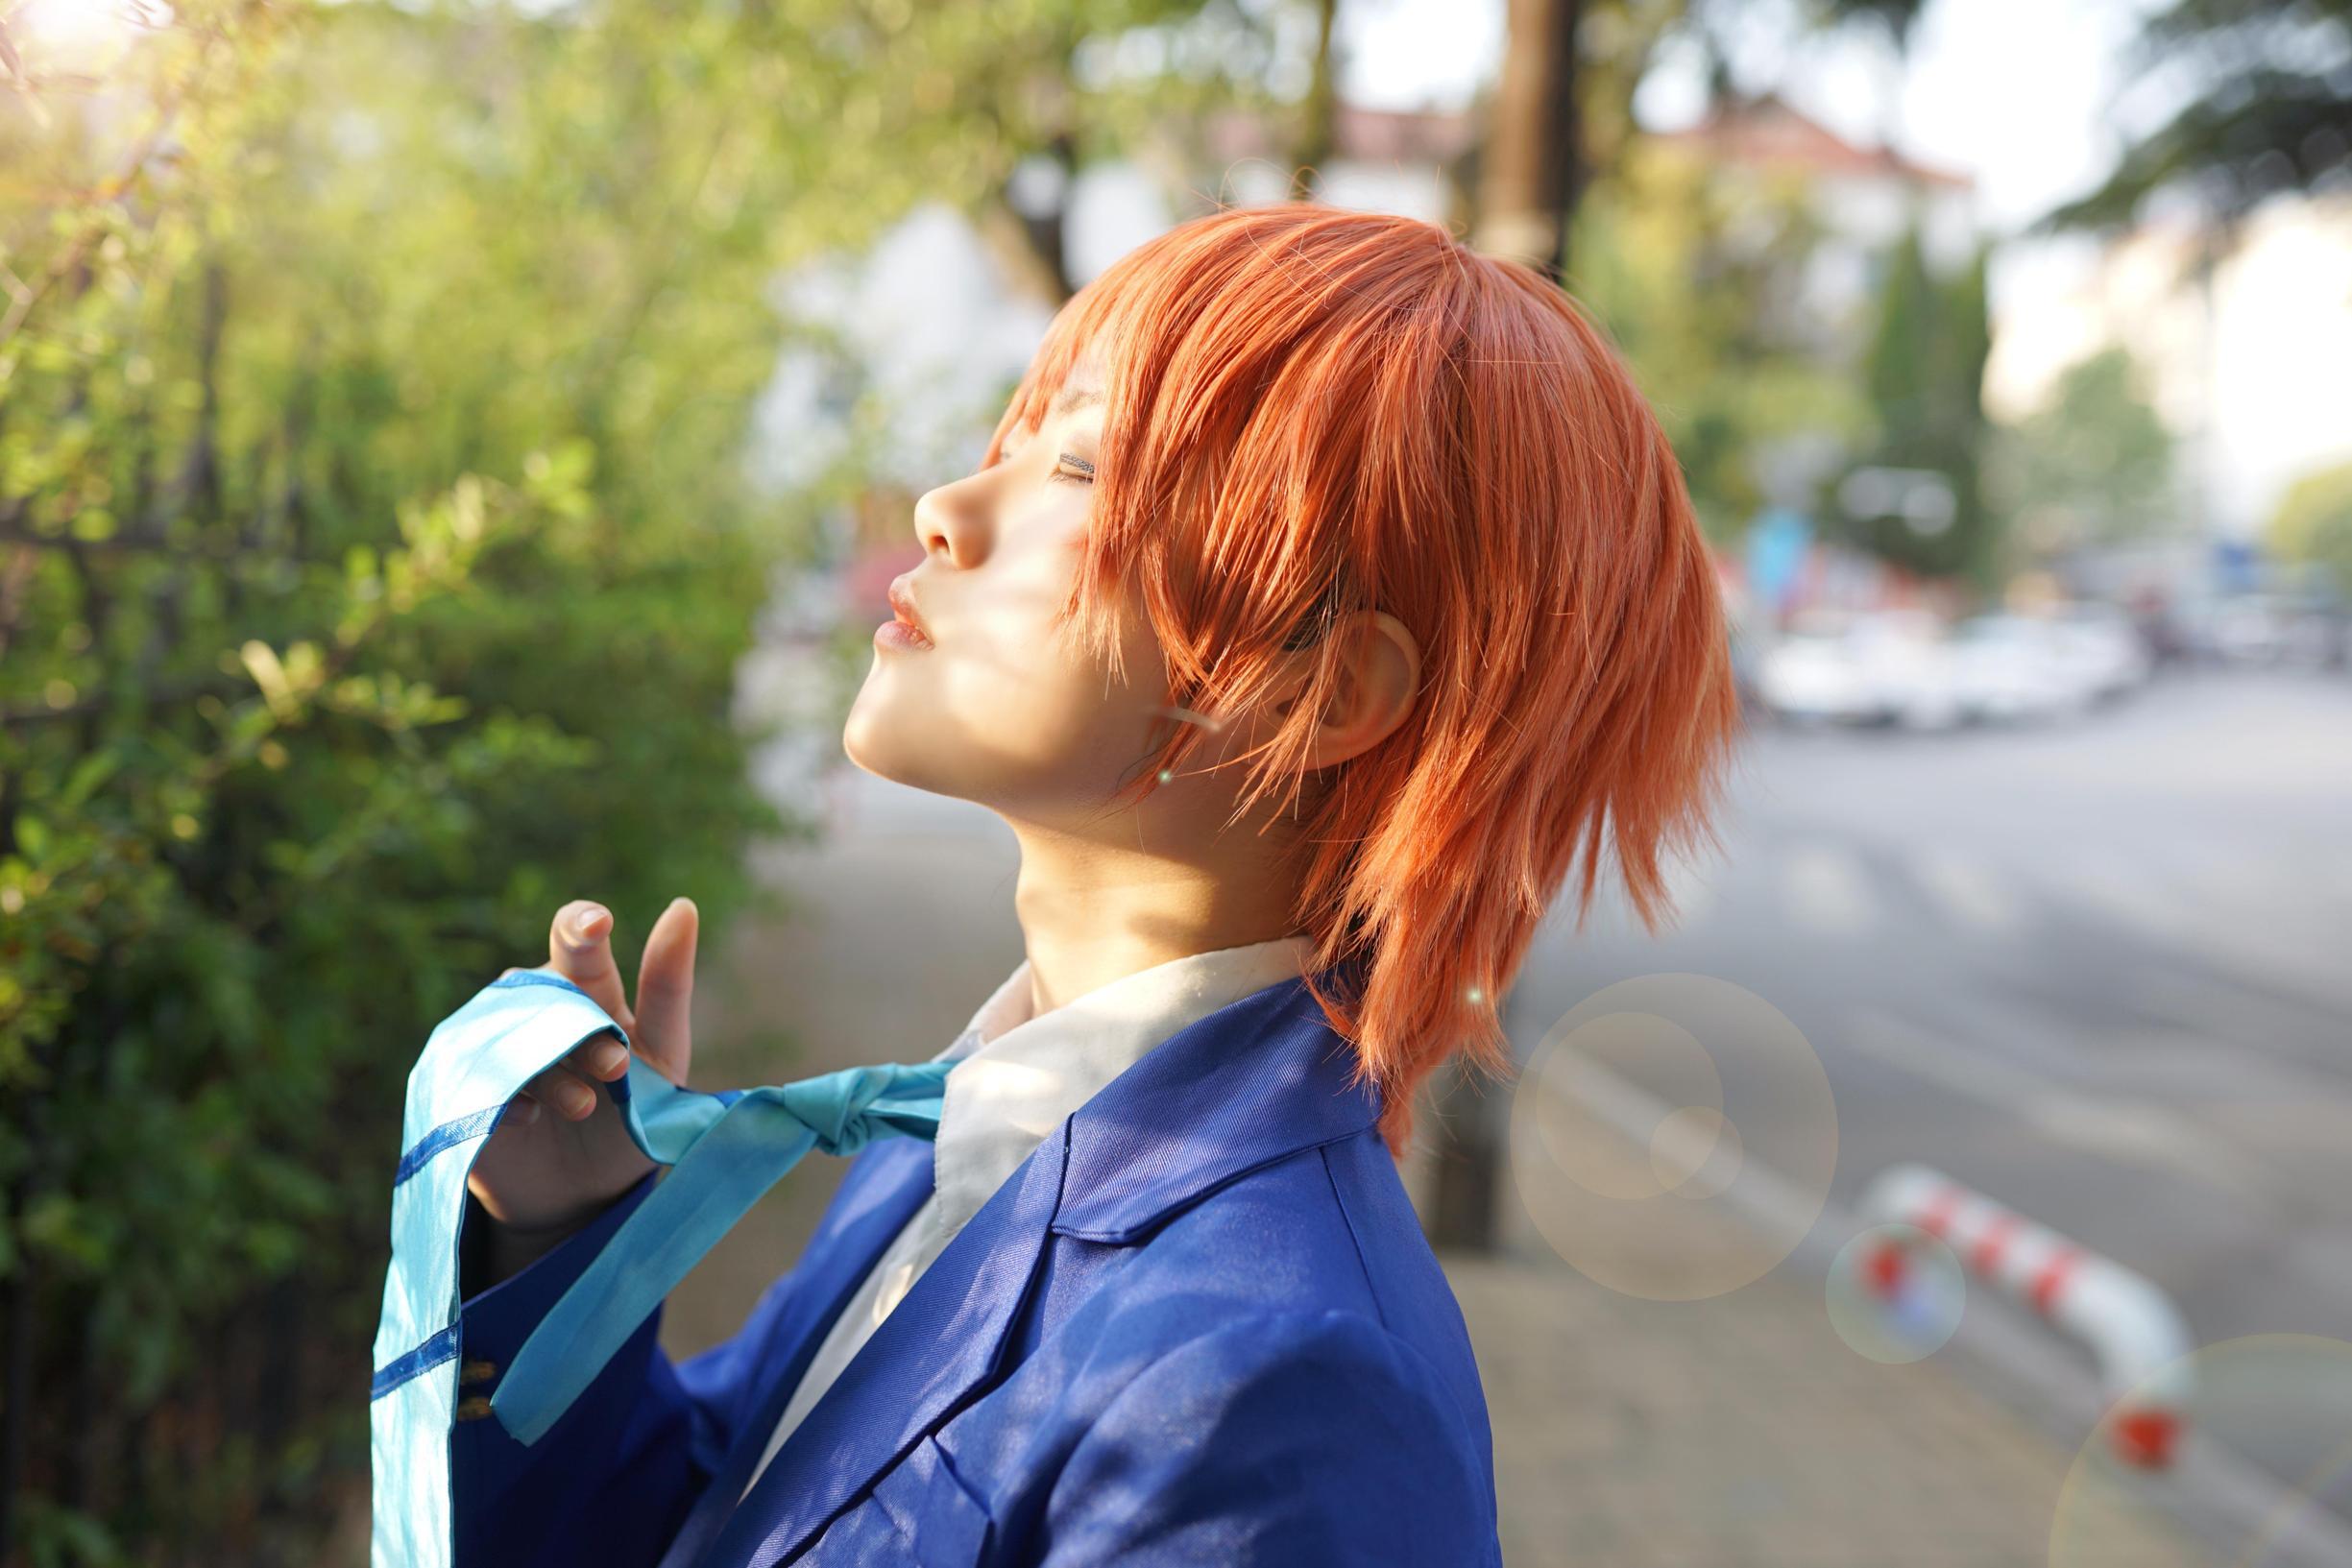 《LOVE LIVE!》正片cosplay【CN:_李笑颜Lee】-第6张